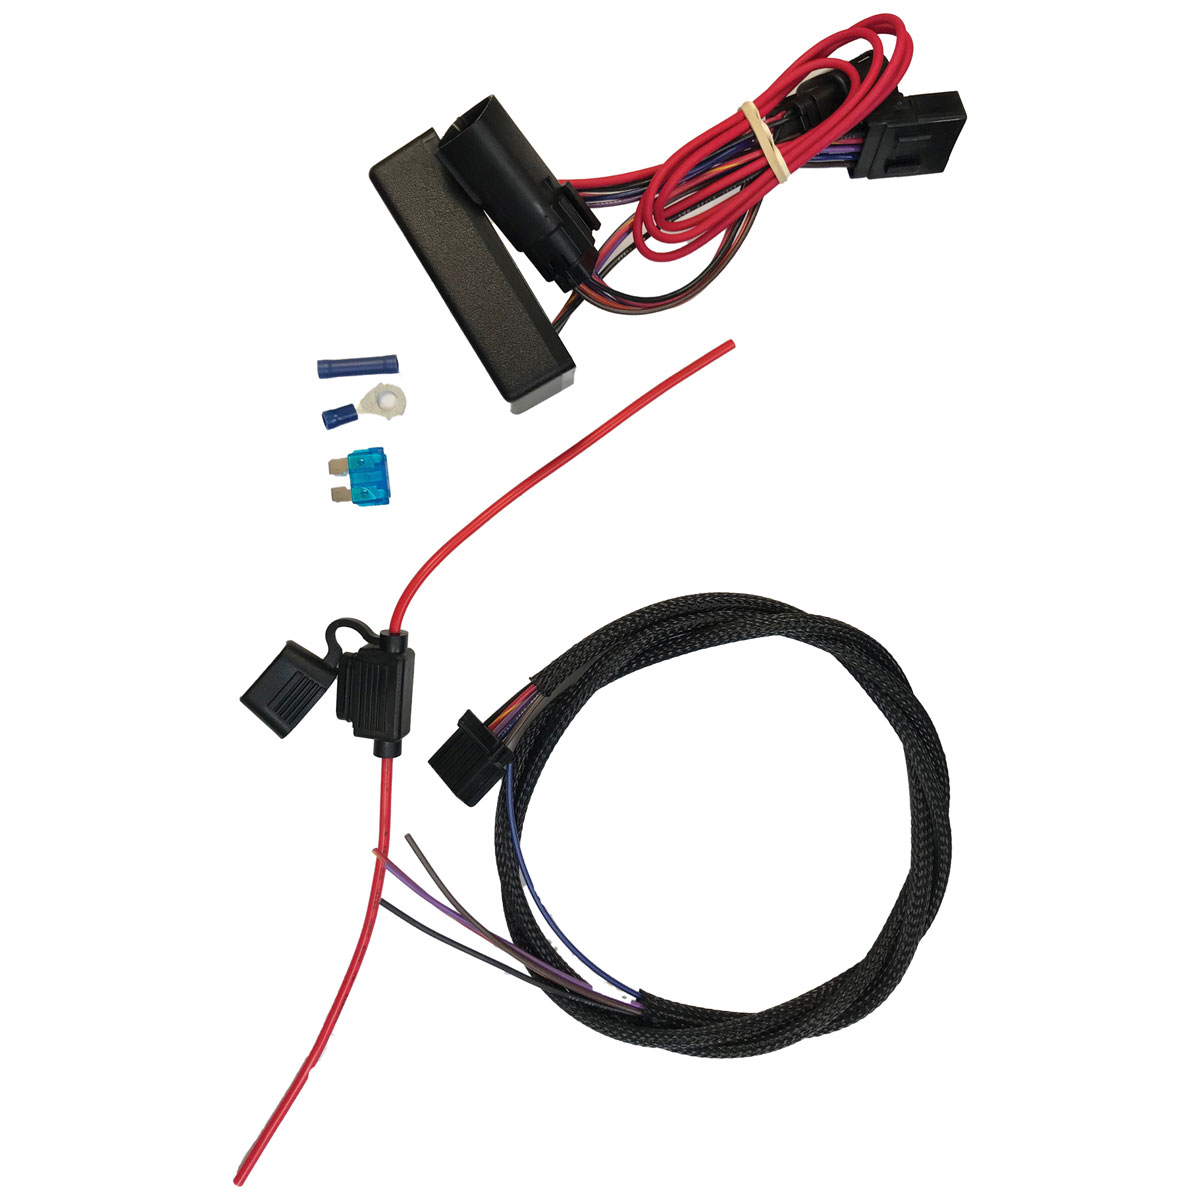 fbi trailer wire harness (8 pin molex connector) fbi harness 8 semi 7 pin trailer plug wiring diagram 8 pin trailer wiring harness #14